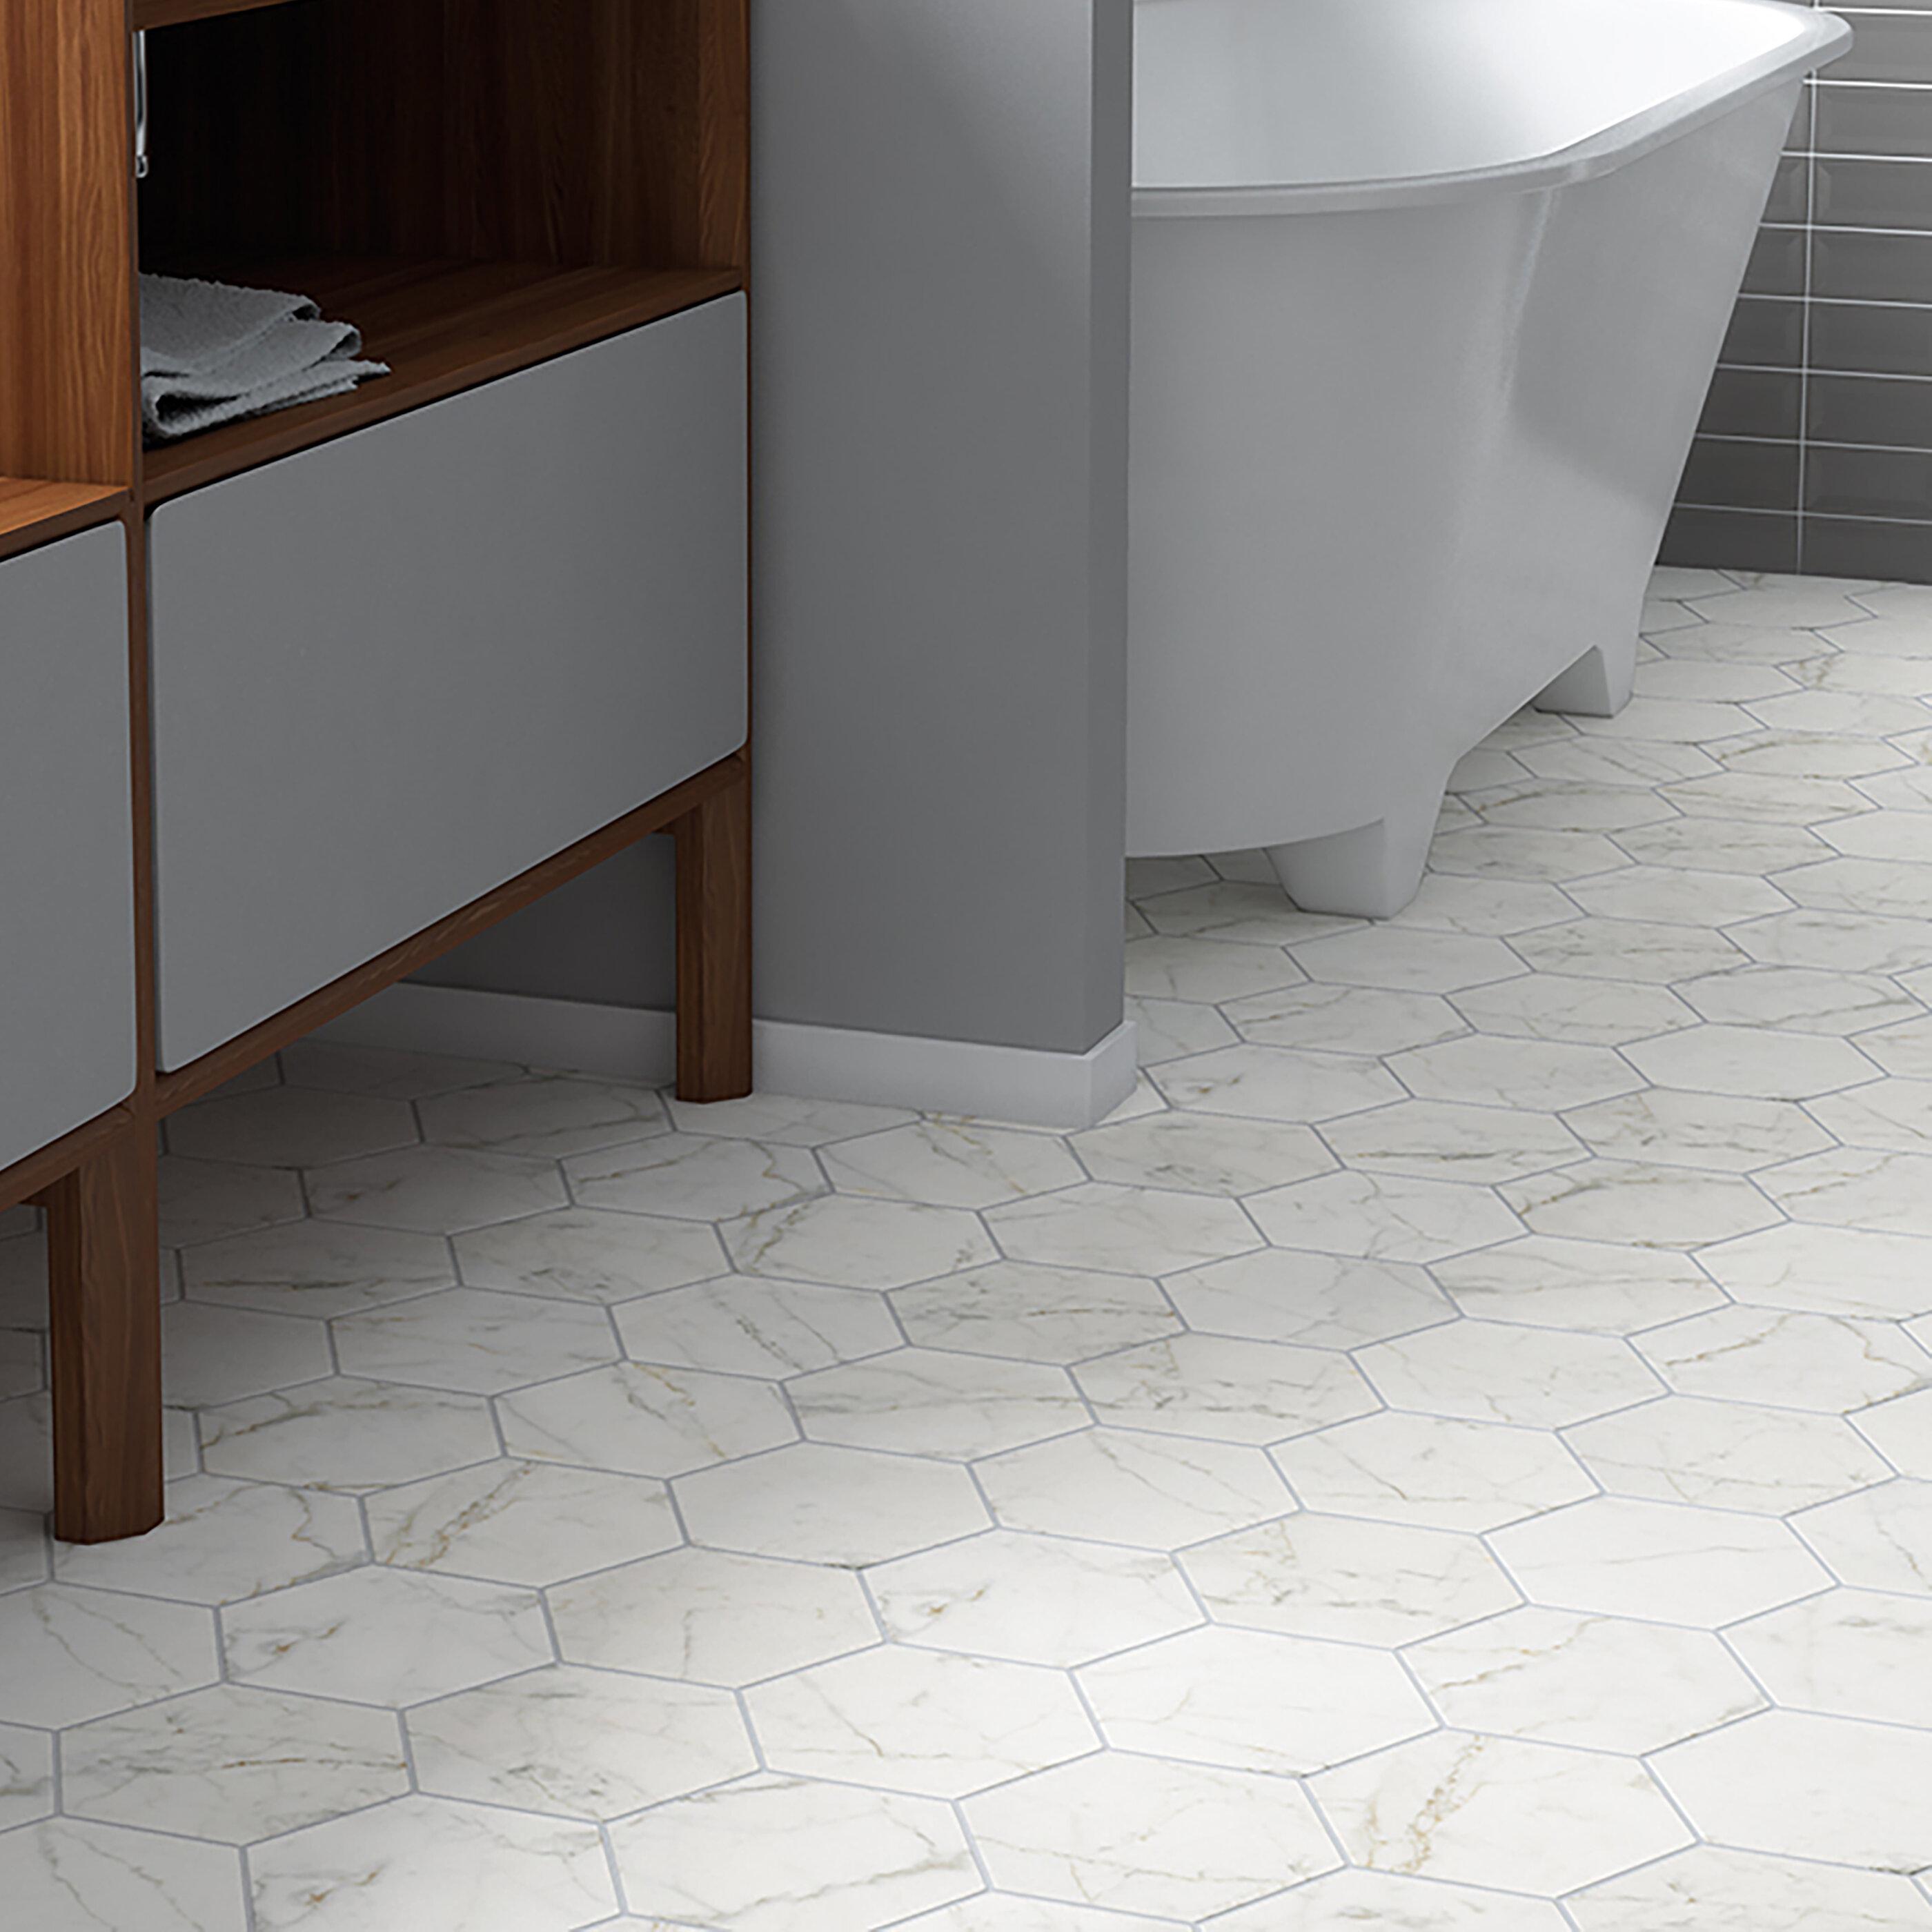 Elitetile Karra Carrara 7 X 8 Porcelain Field Tile In White Gray Reviews Wayfair